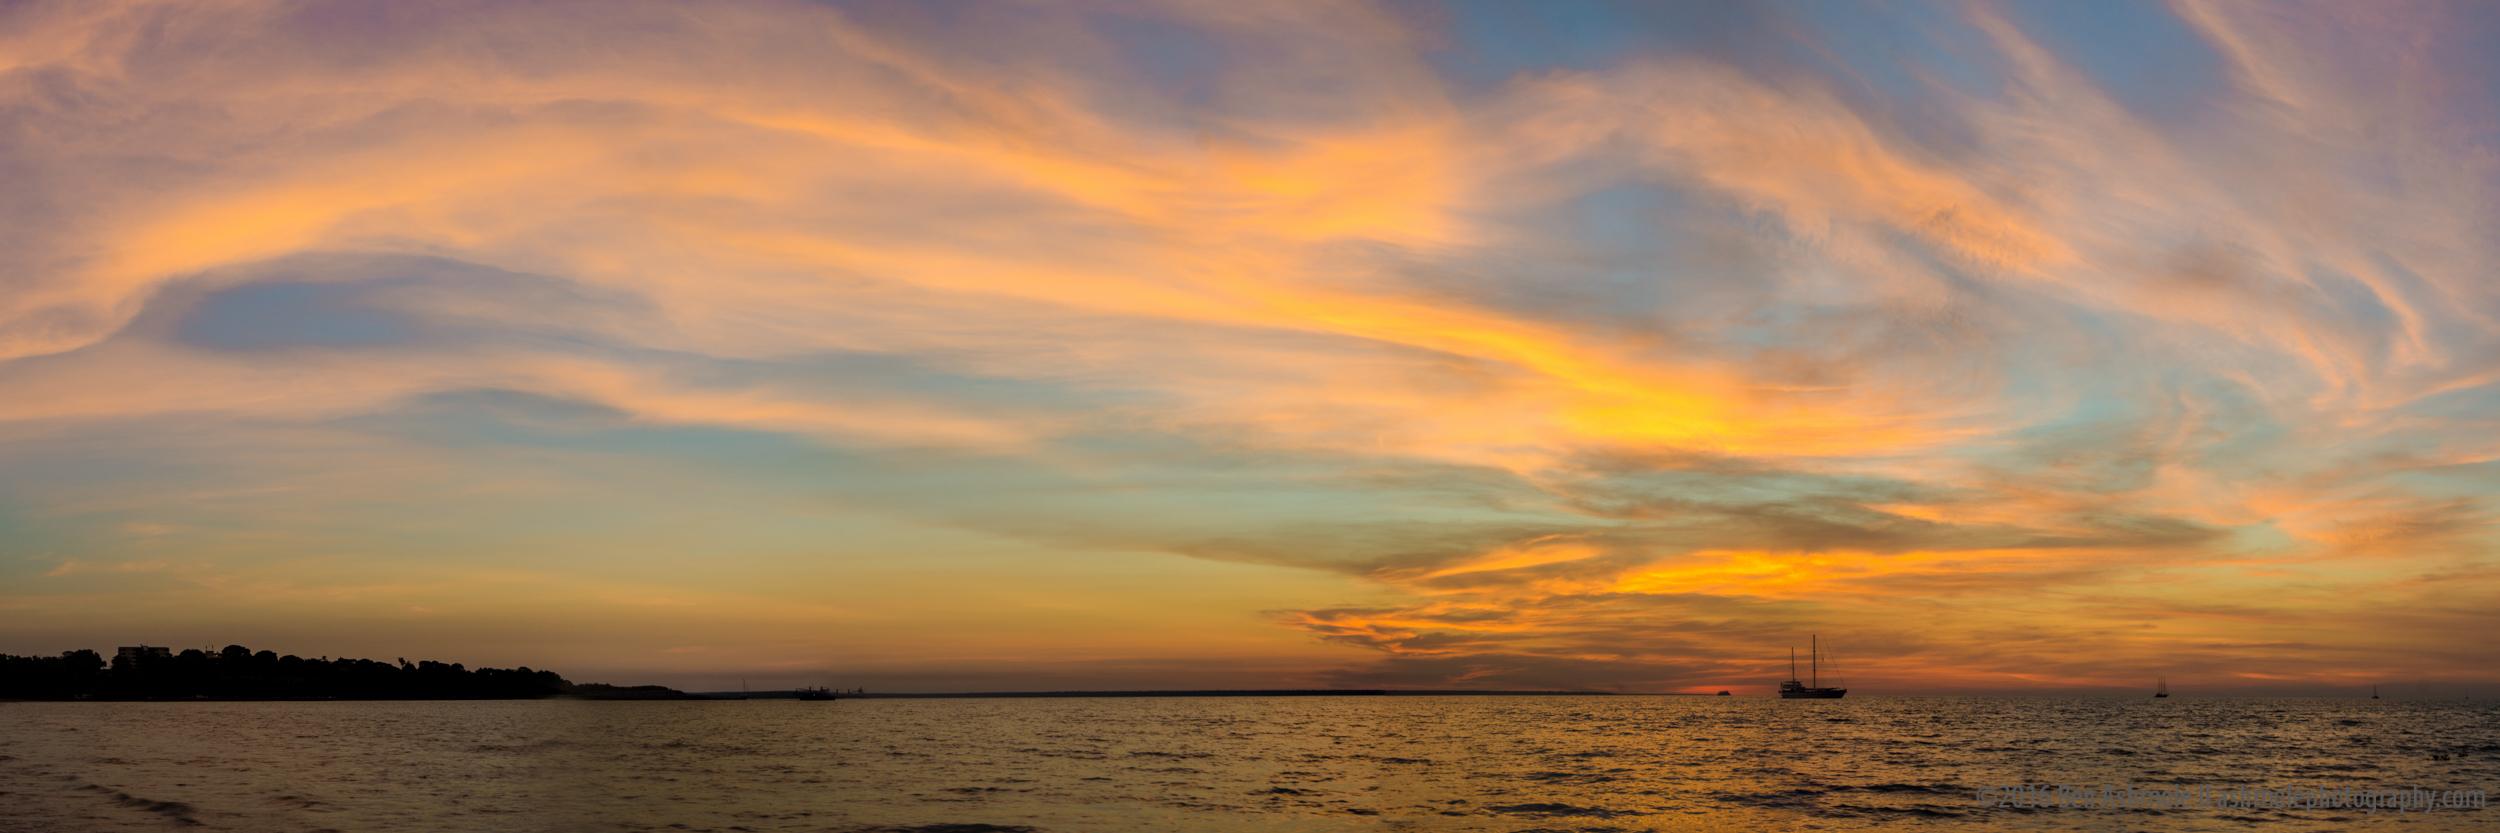 Panoramic Tropical Sunset, Mindil Beach, Darwin, NT, Australia